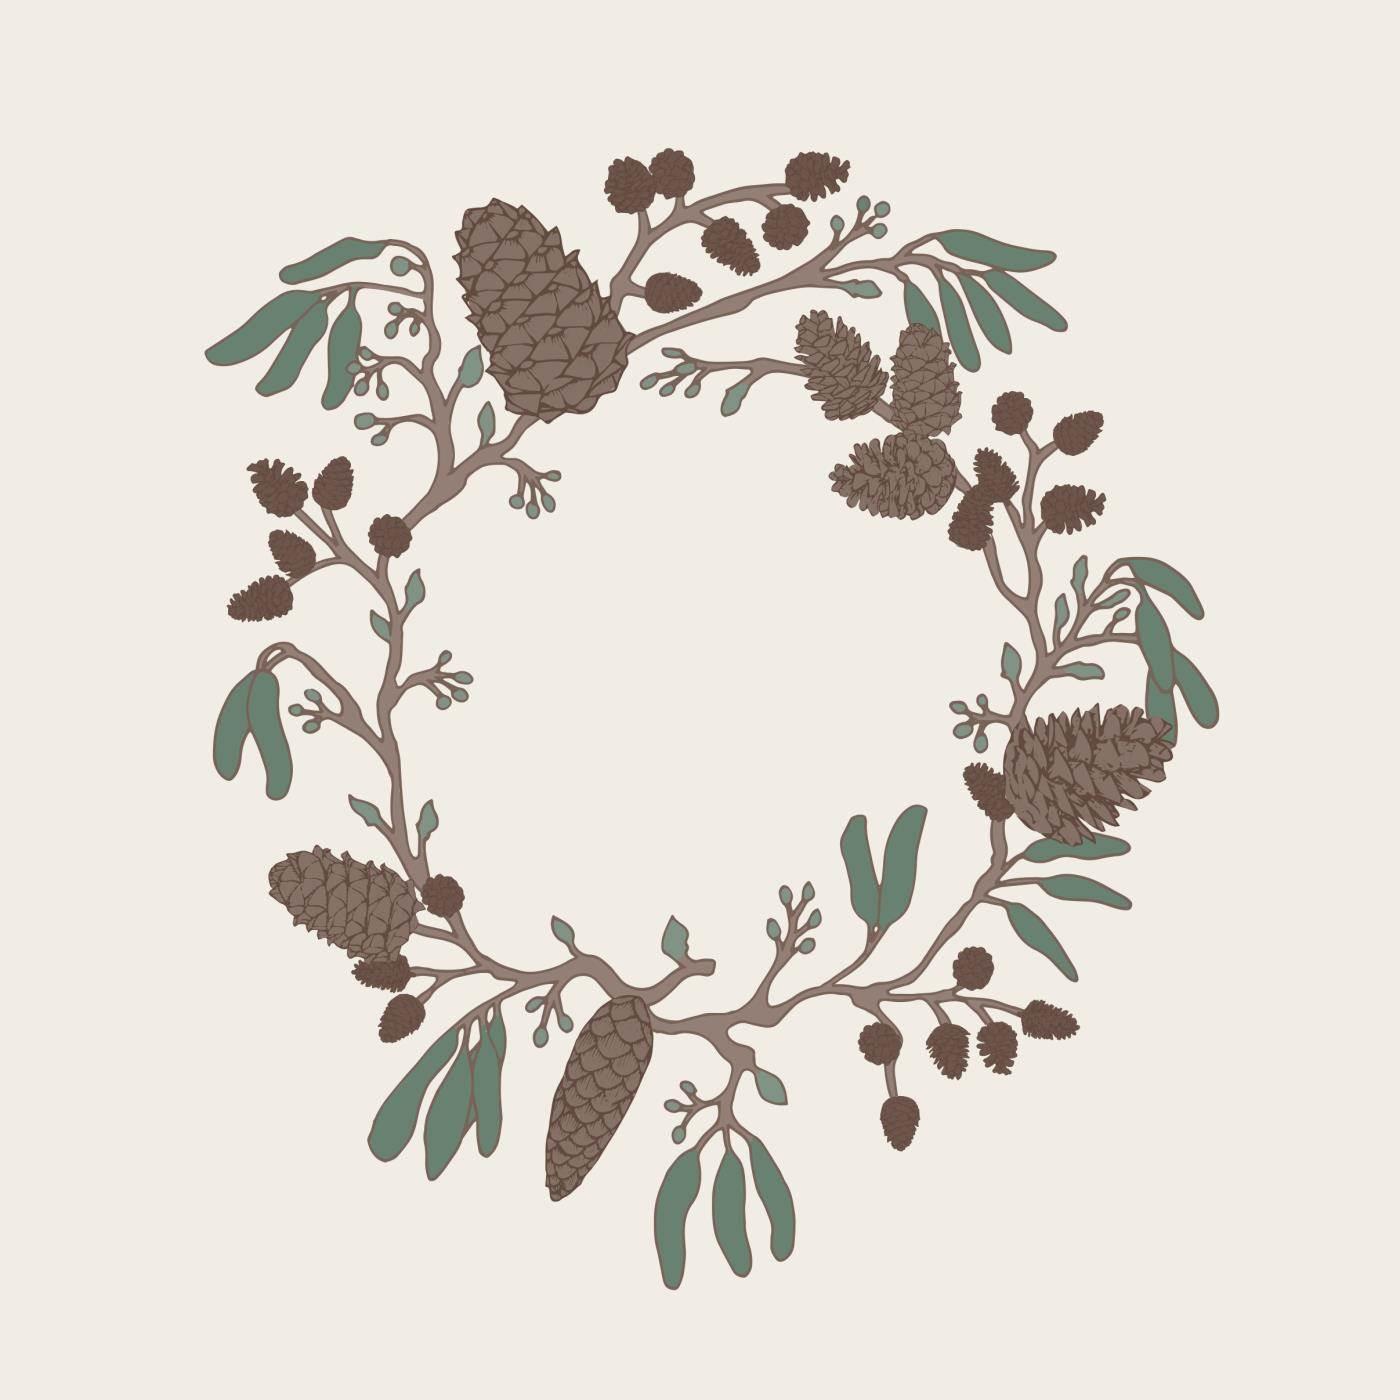 IB LAURSEN Papírové ubrousky Wreath of Cones, zelená barva, hnědá barva, papír